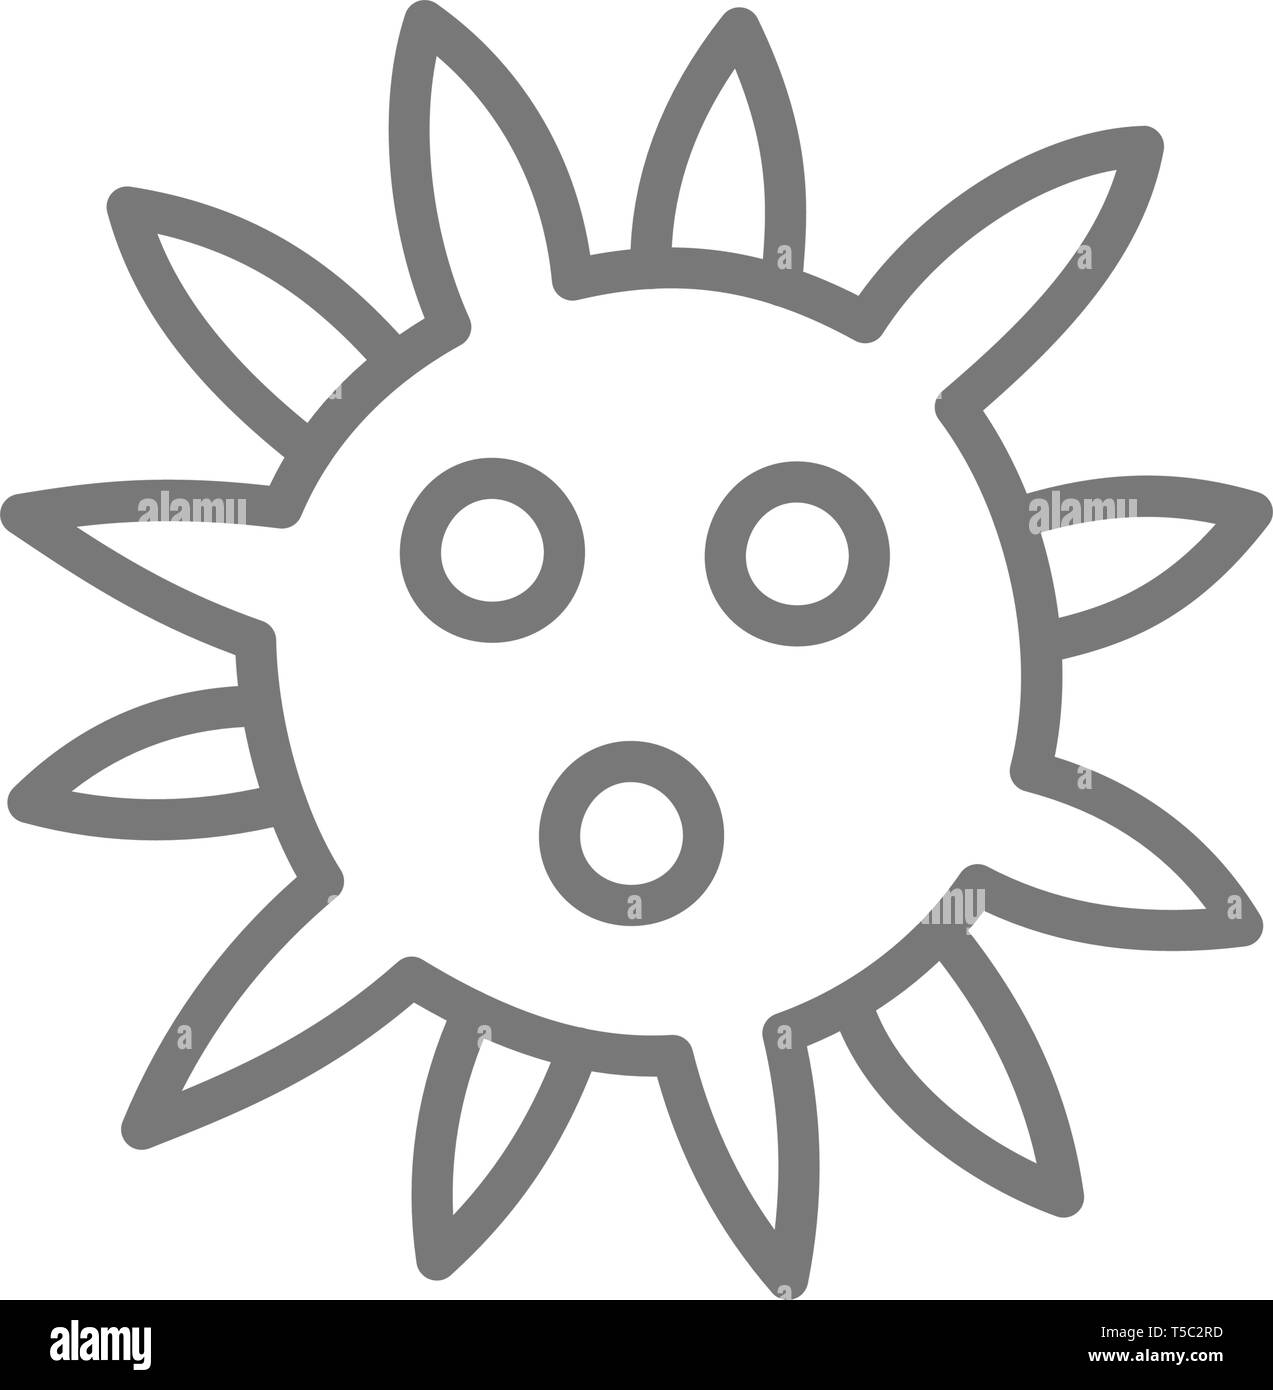 Virus, bacteria line icon. - Stock Image